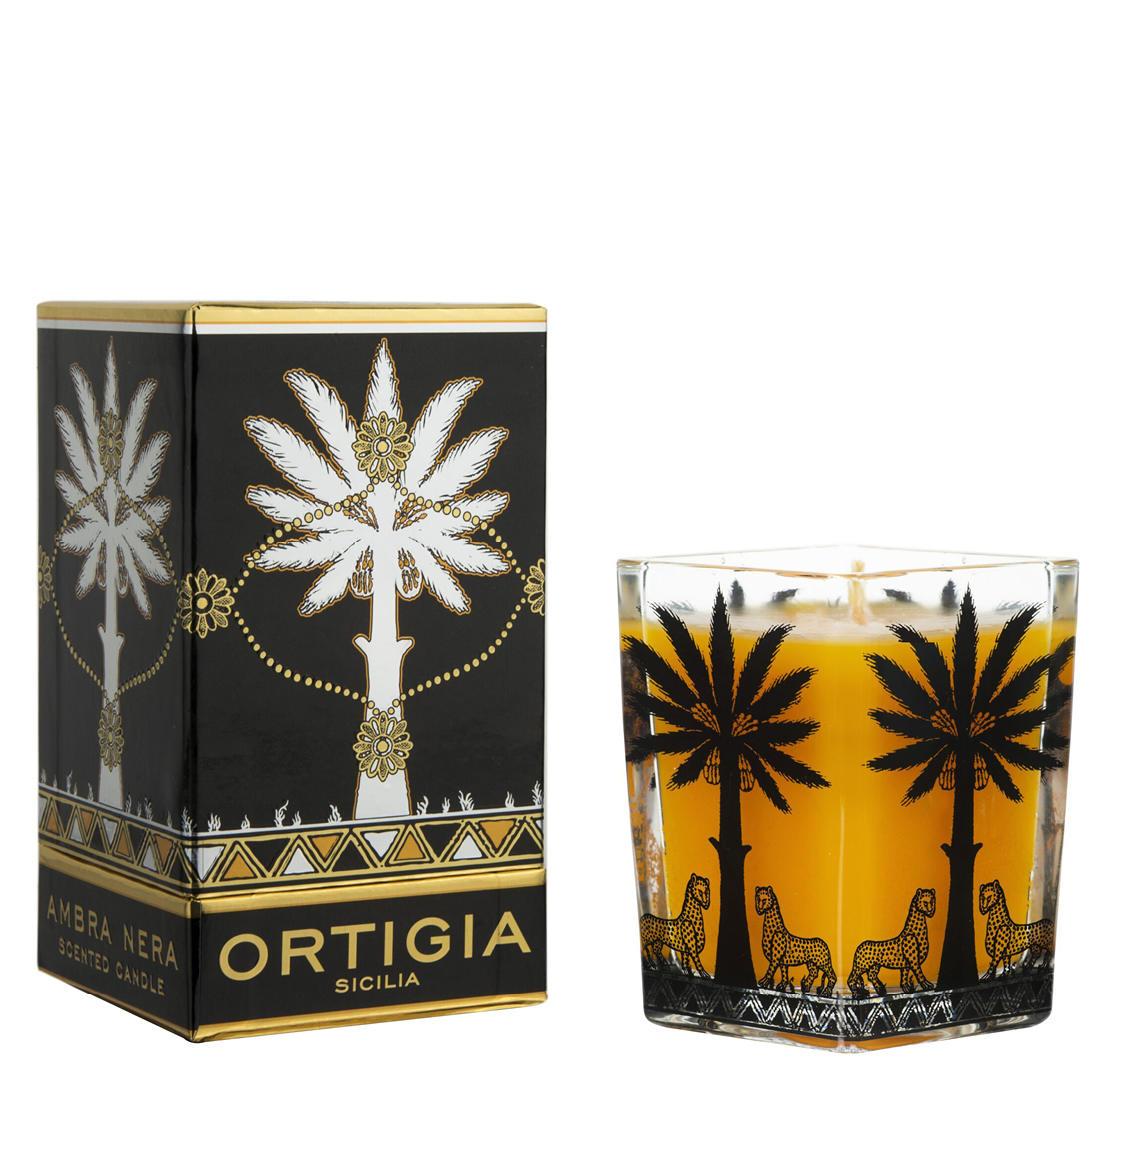 Ortigia Sicilia Ambra Nera Candle 170g